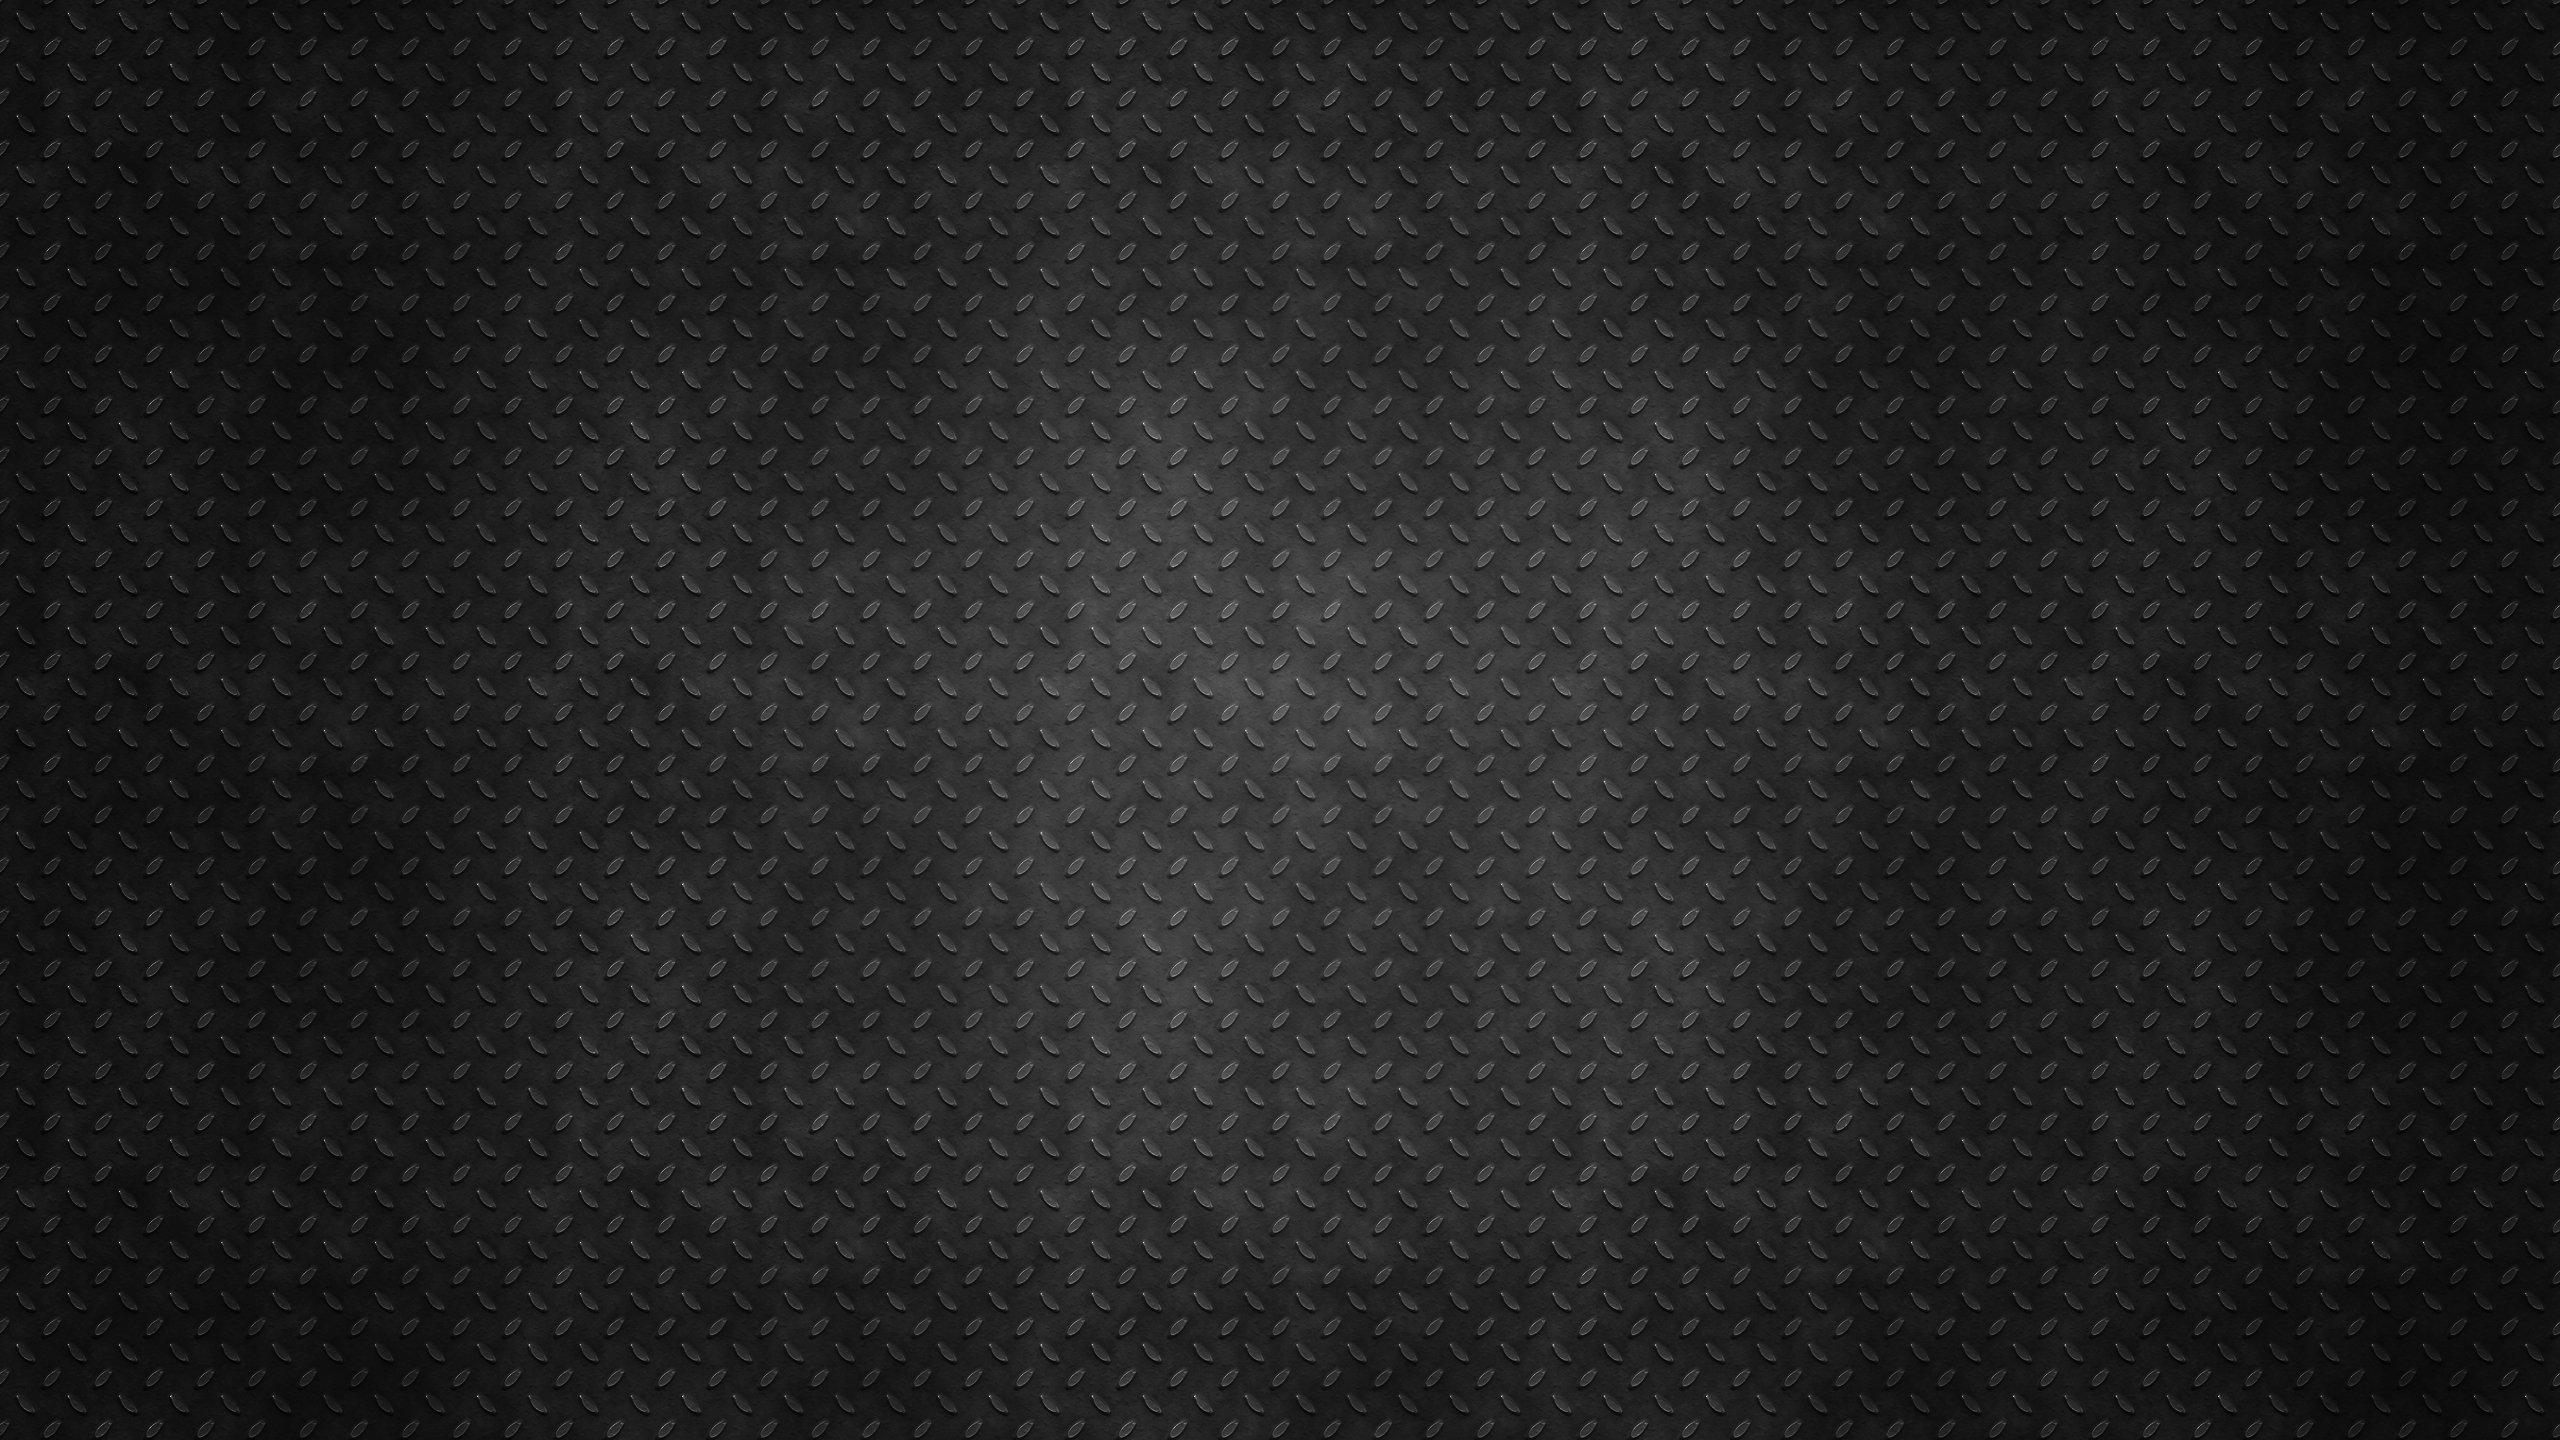 Metal Texture Wallpaper